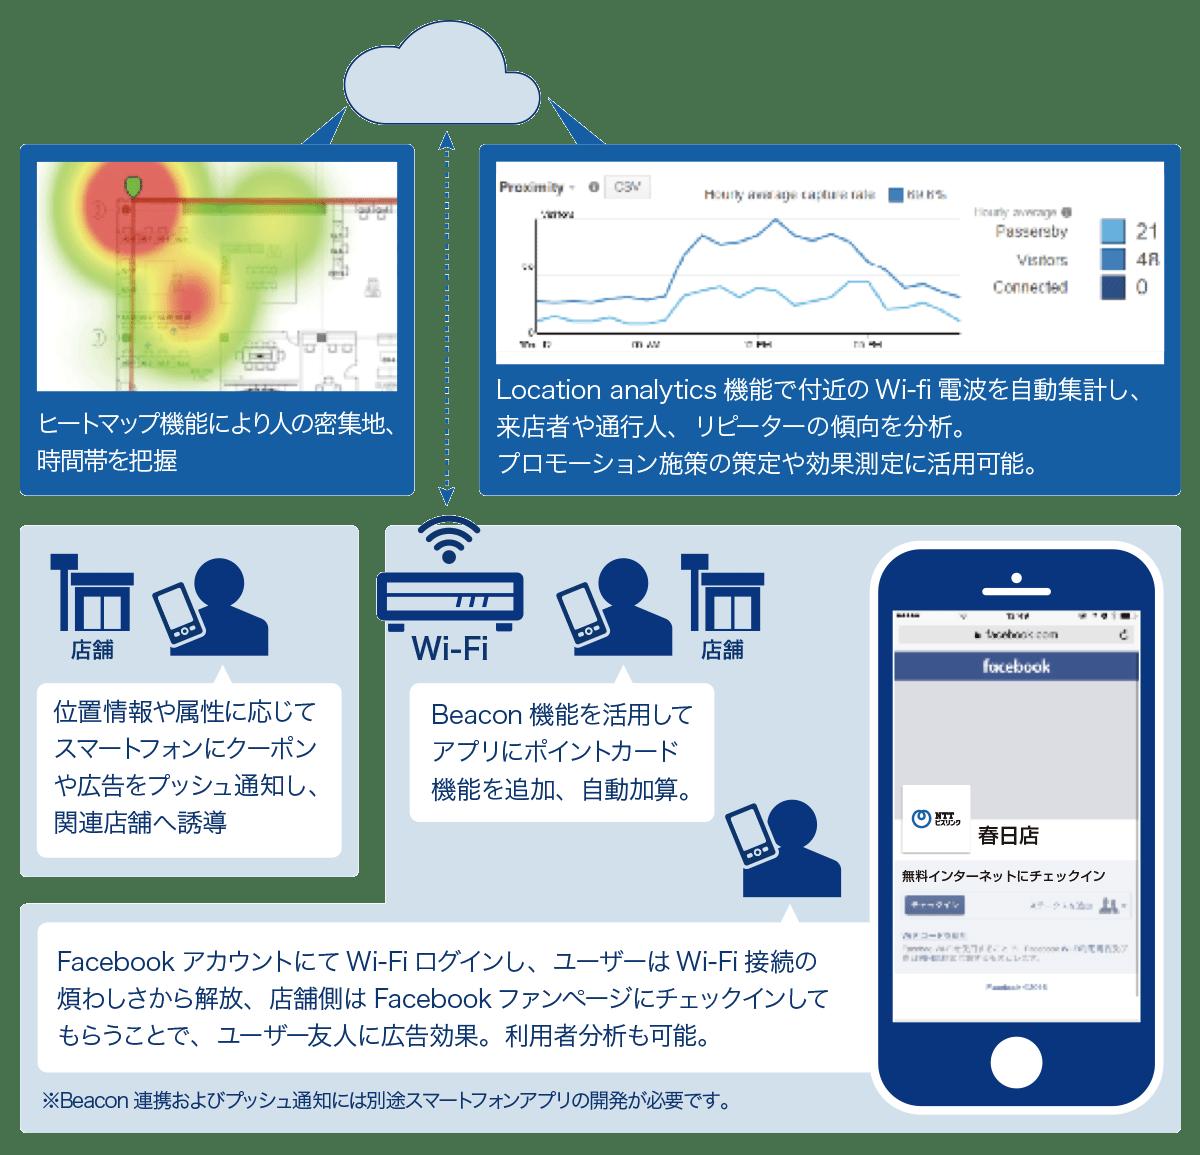 O2Oマーケティング施策としての店舗Wi-Fi活用